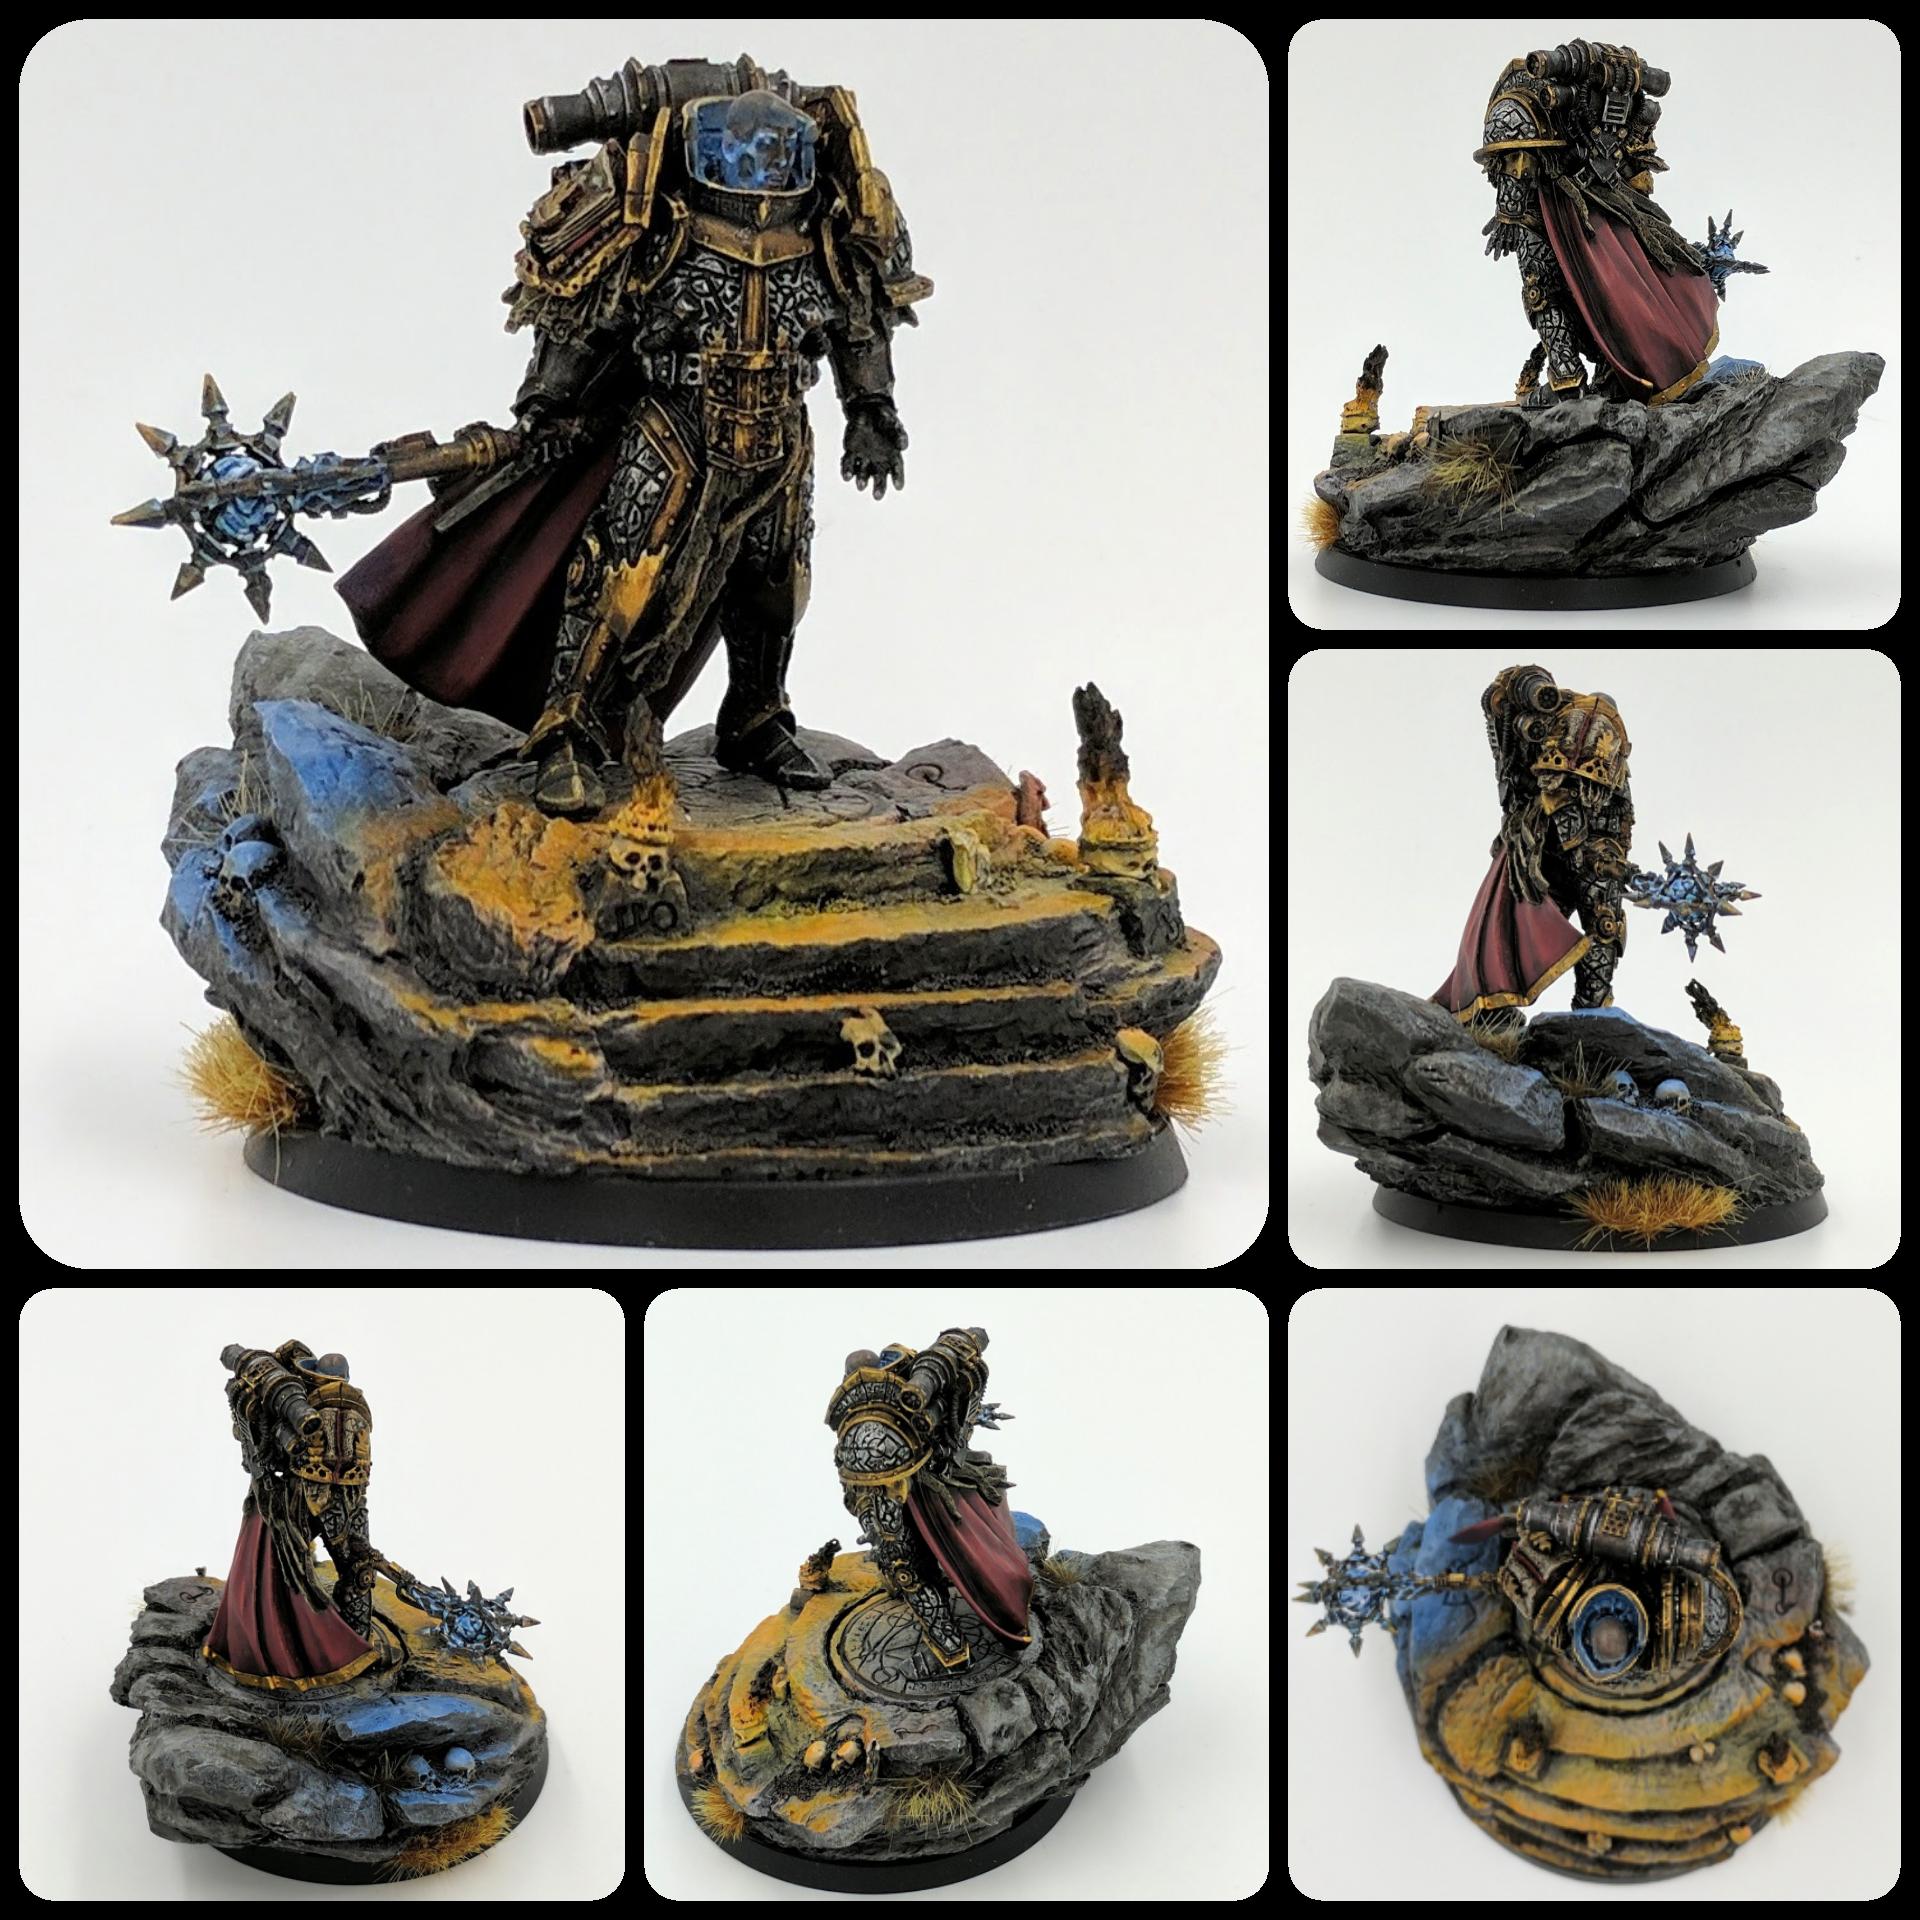 Lorgar - Primarch of the Word Bearers